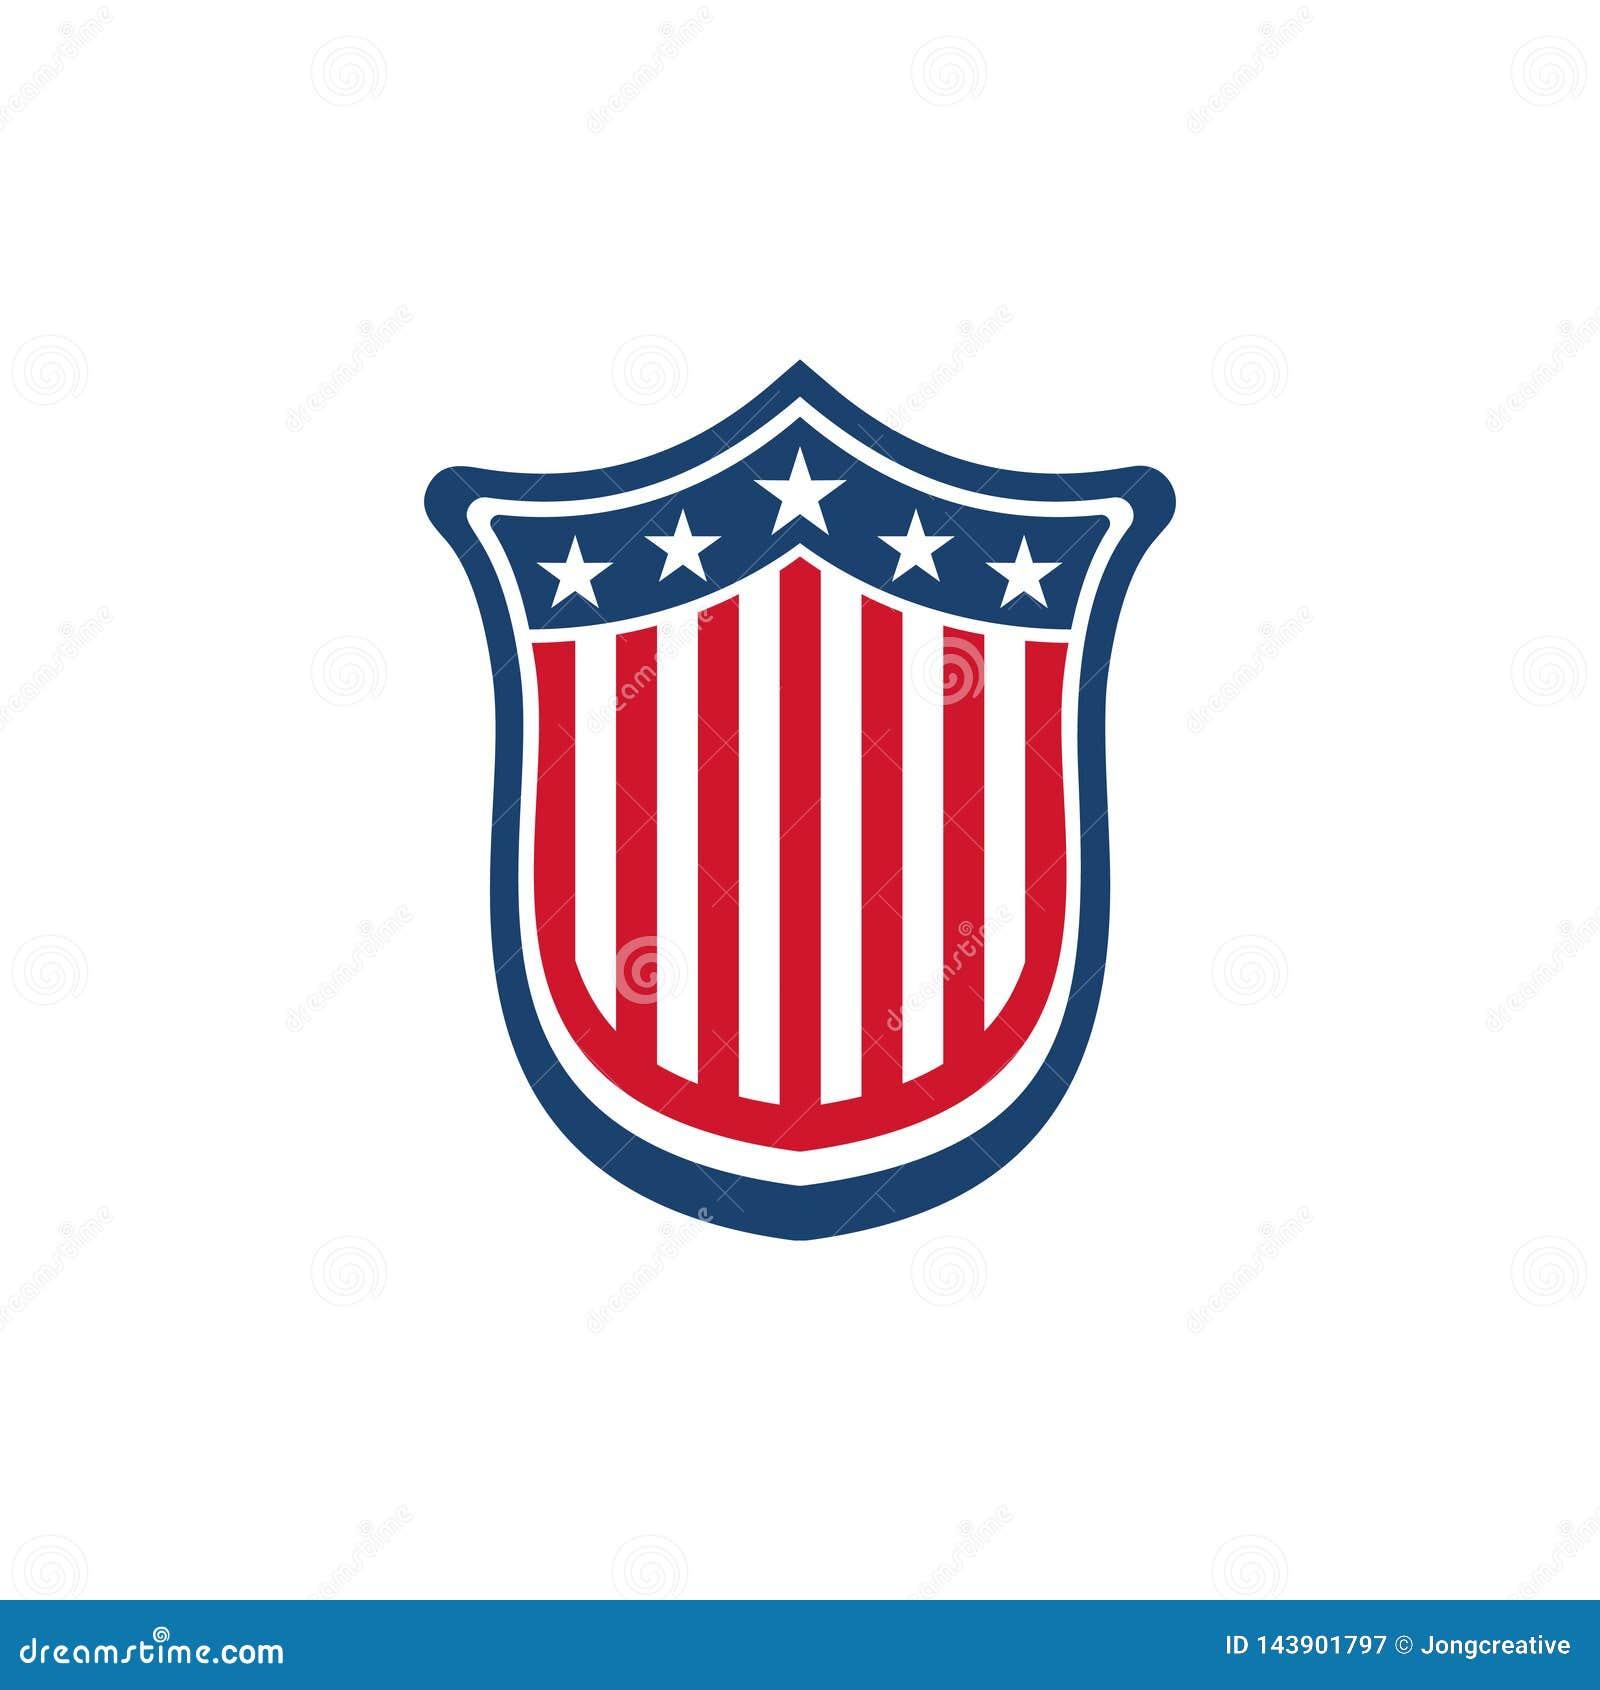 Unique Star American Flag Shield Symbol Isolated Stock